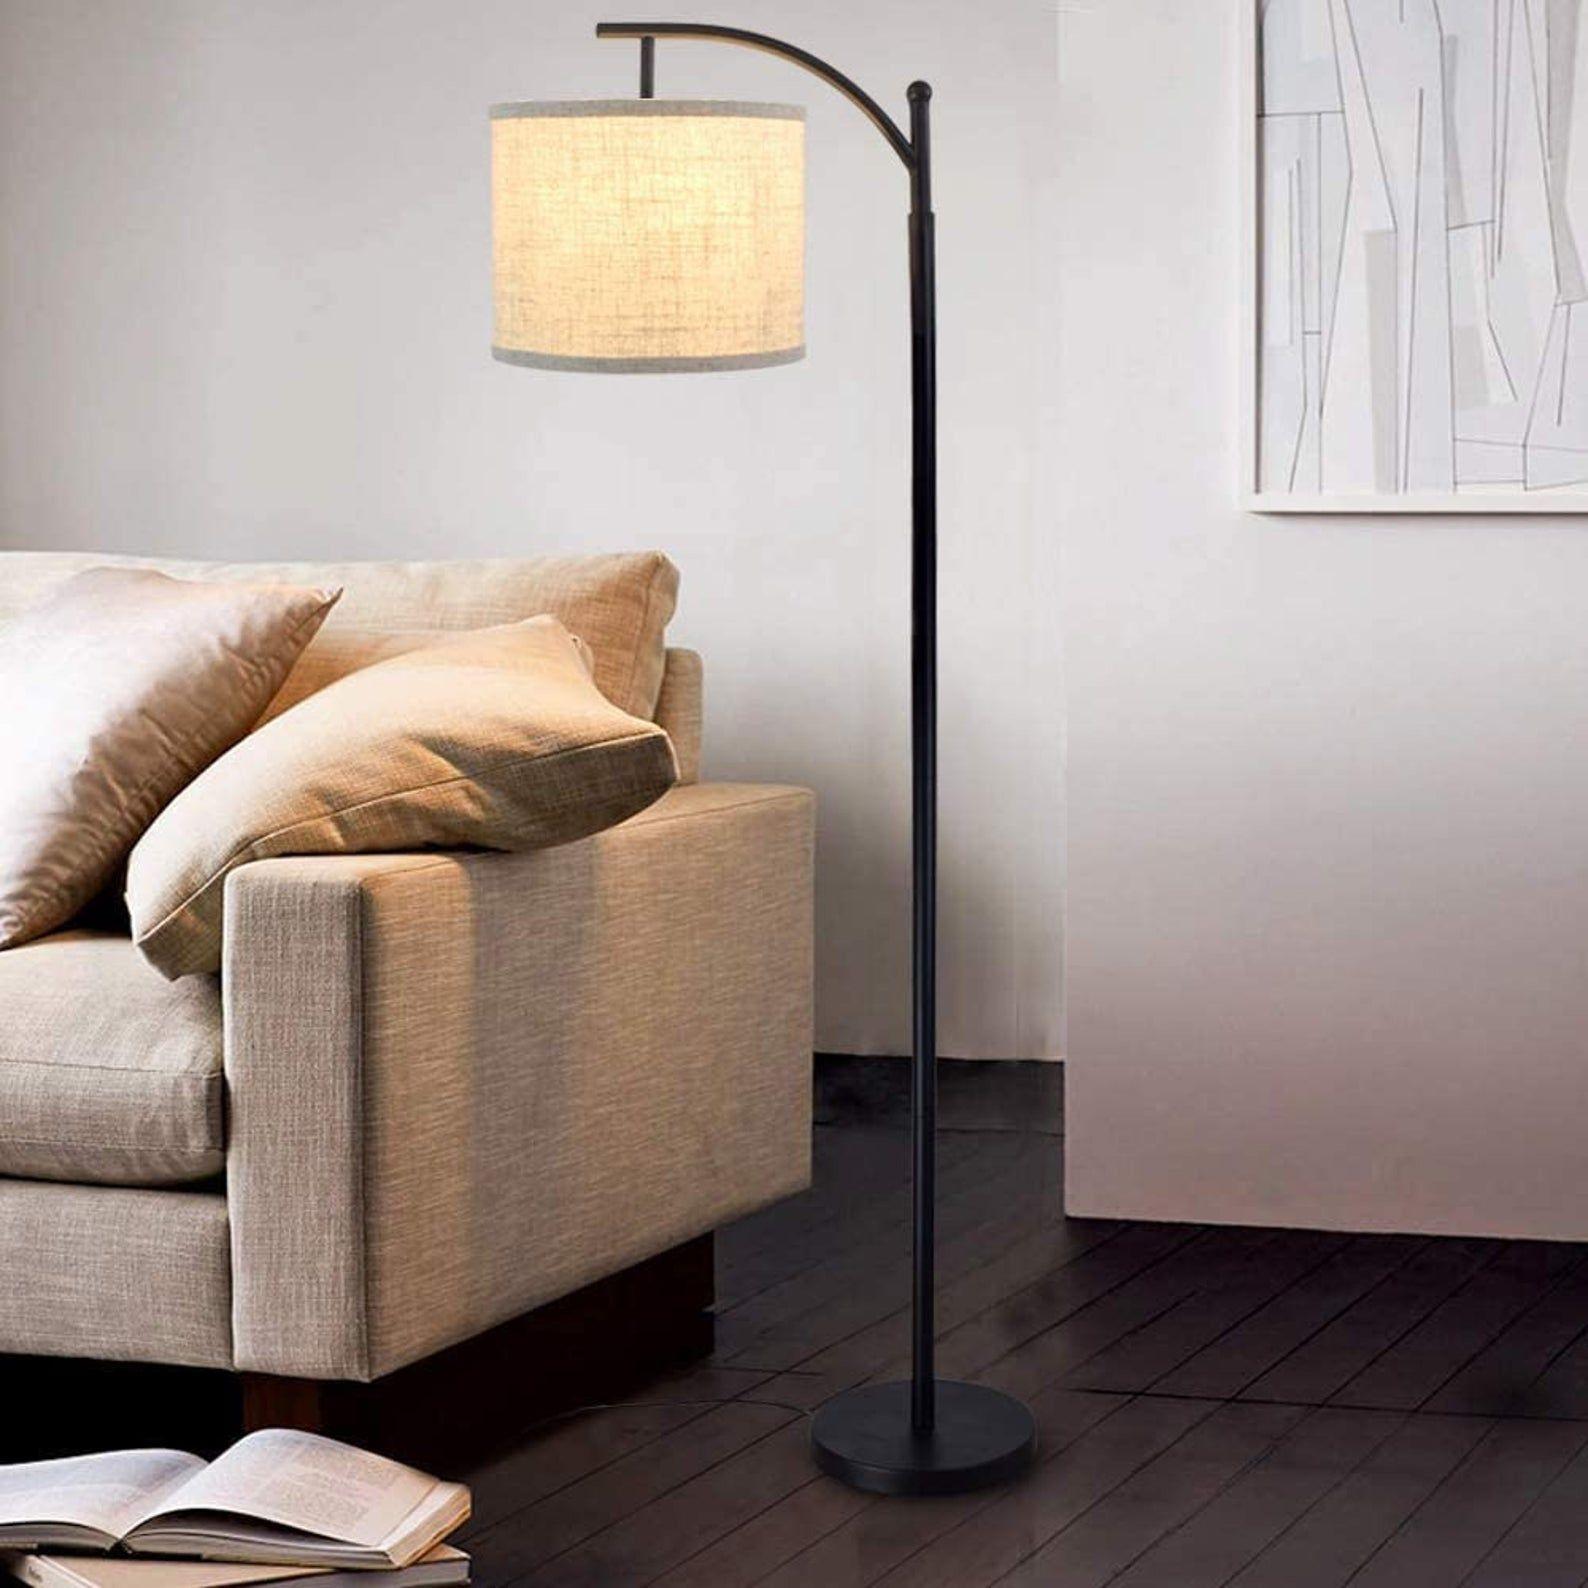 Pin On Apartment House Rental Ideas